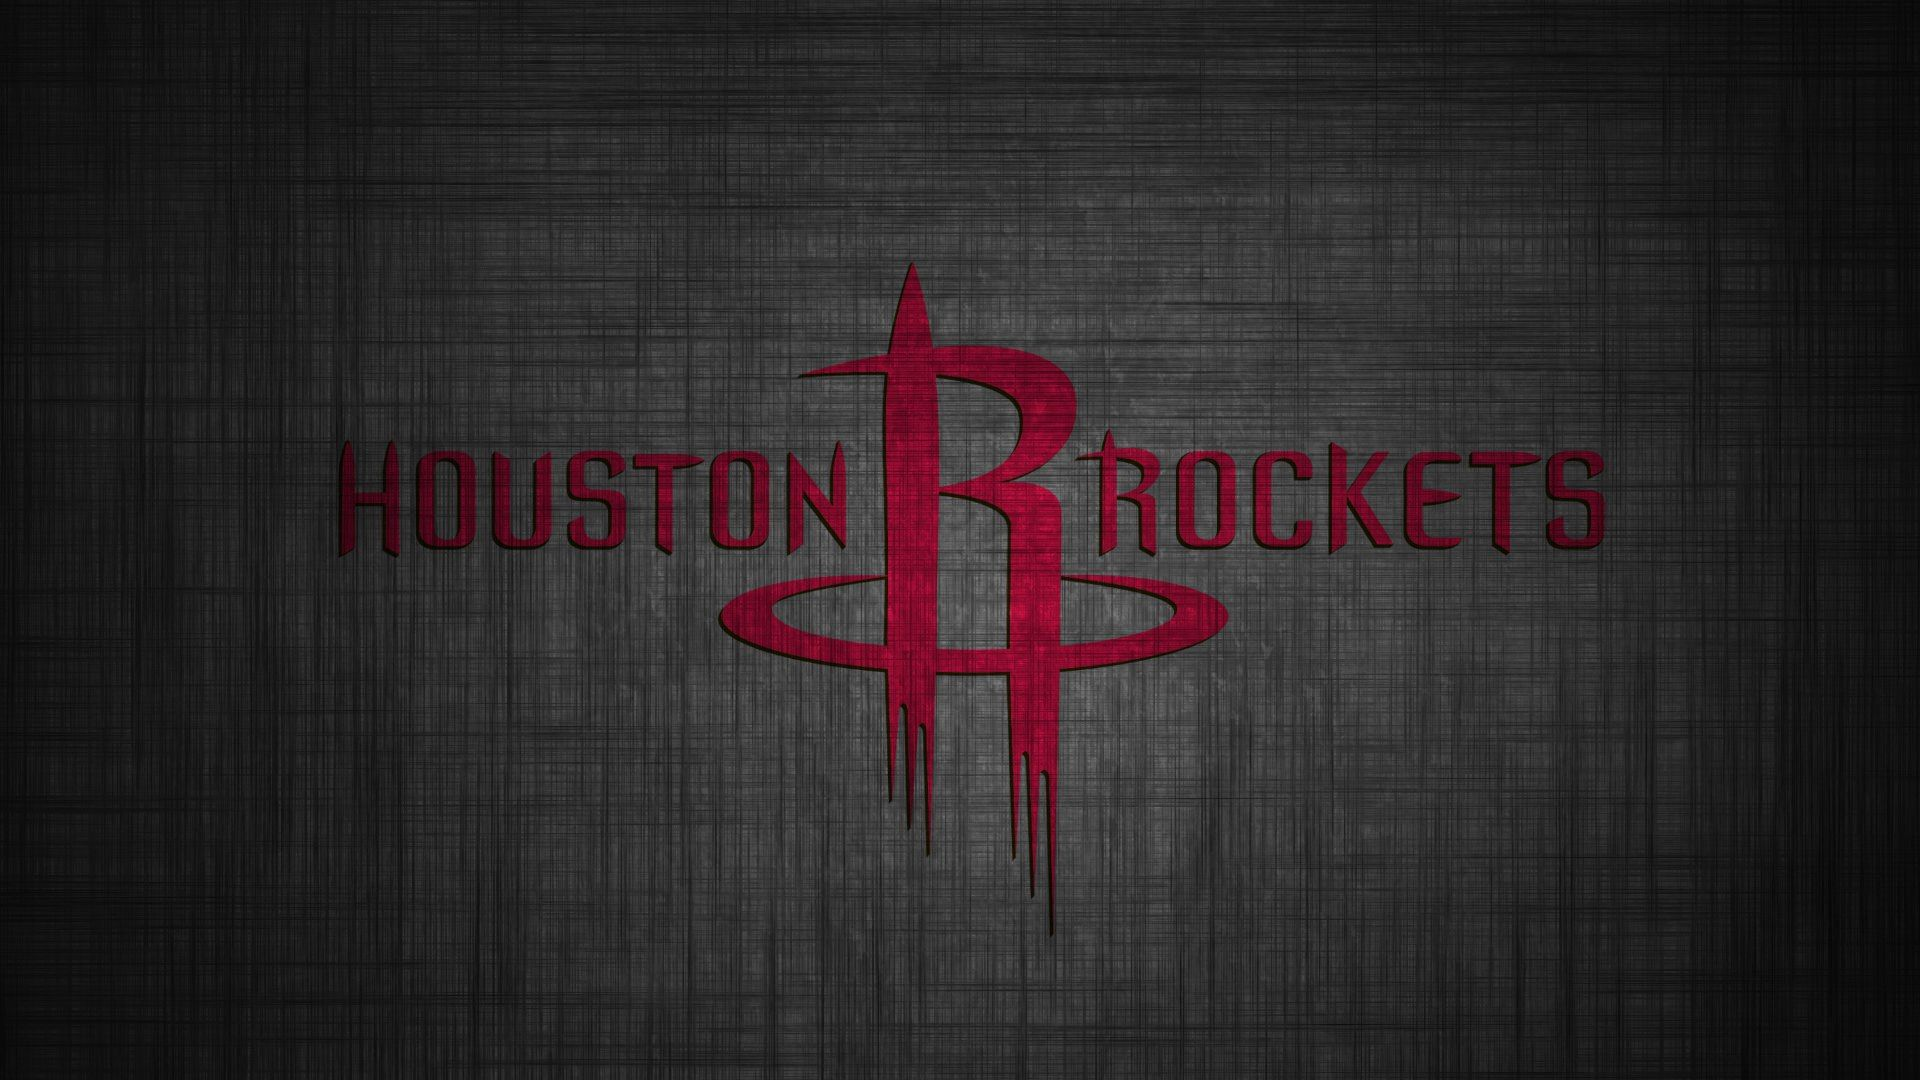 Houston Rockets Logo Wallpaper Wallpaperwiki Houston Rockets Rockets Logo Logo Wallpaper Hd